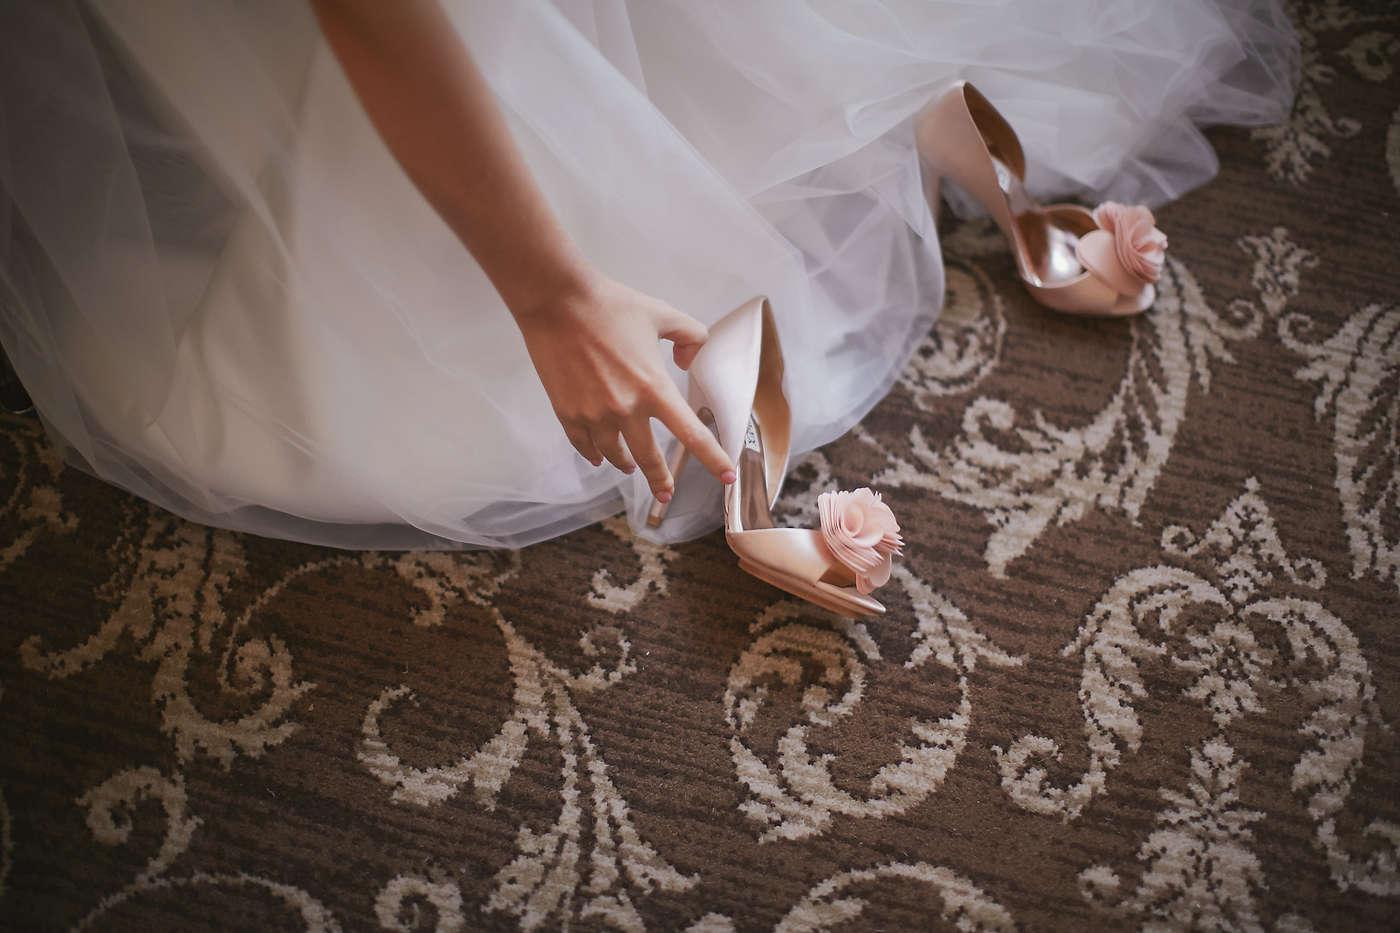 картинки свадьба уже скоро ничего